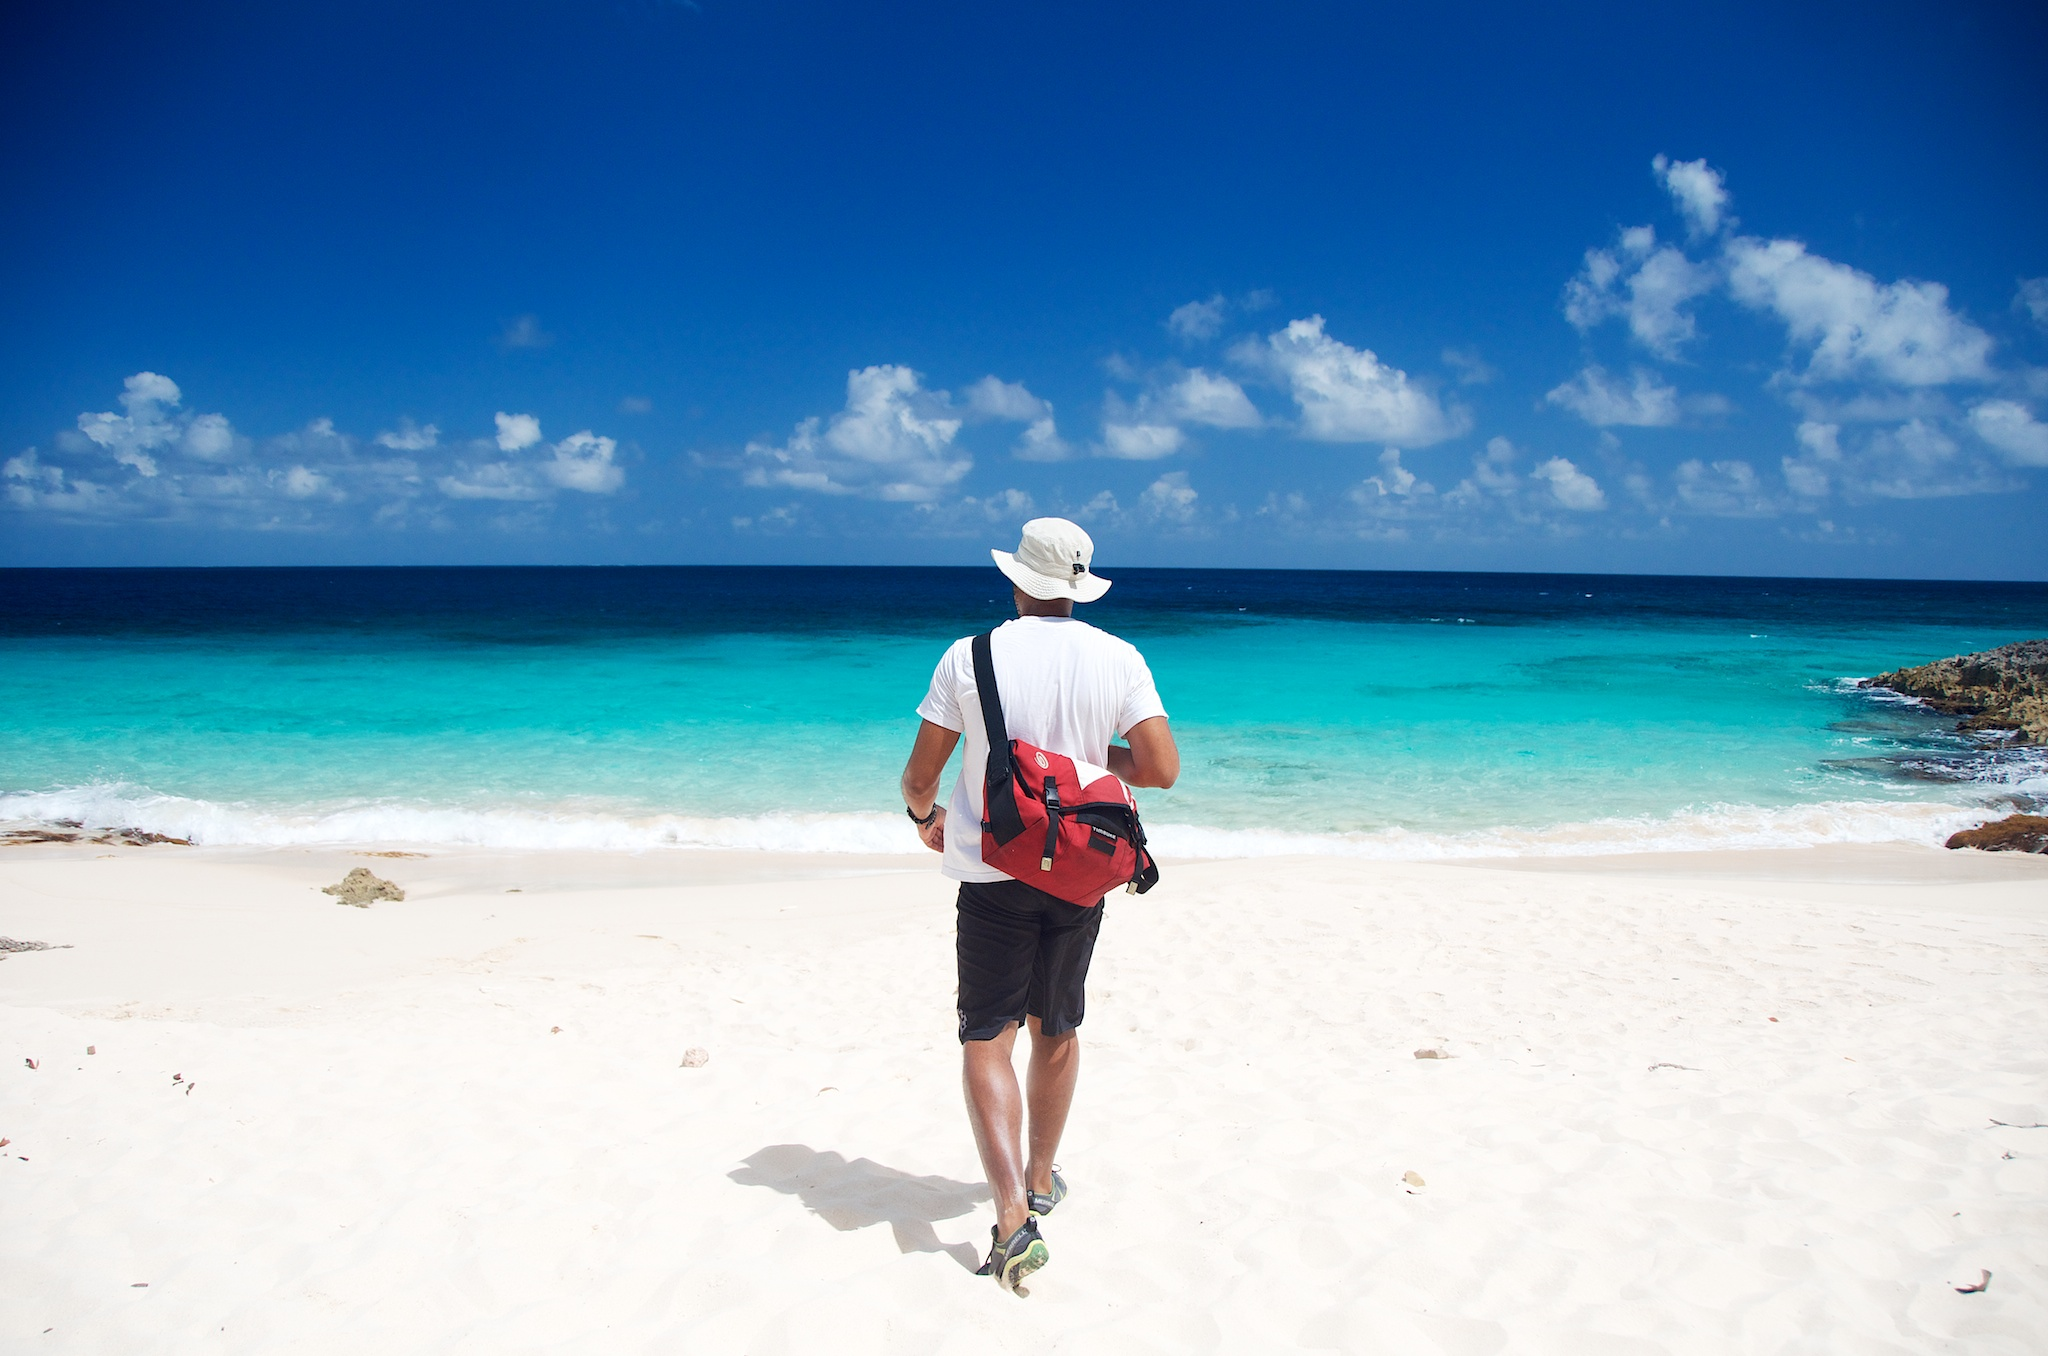 Me-in-Anguilla-1